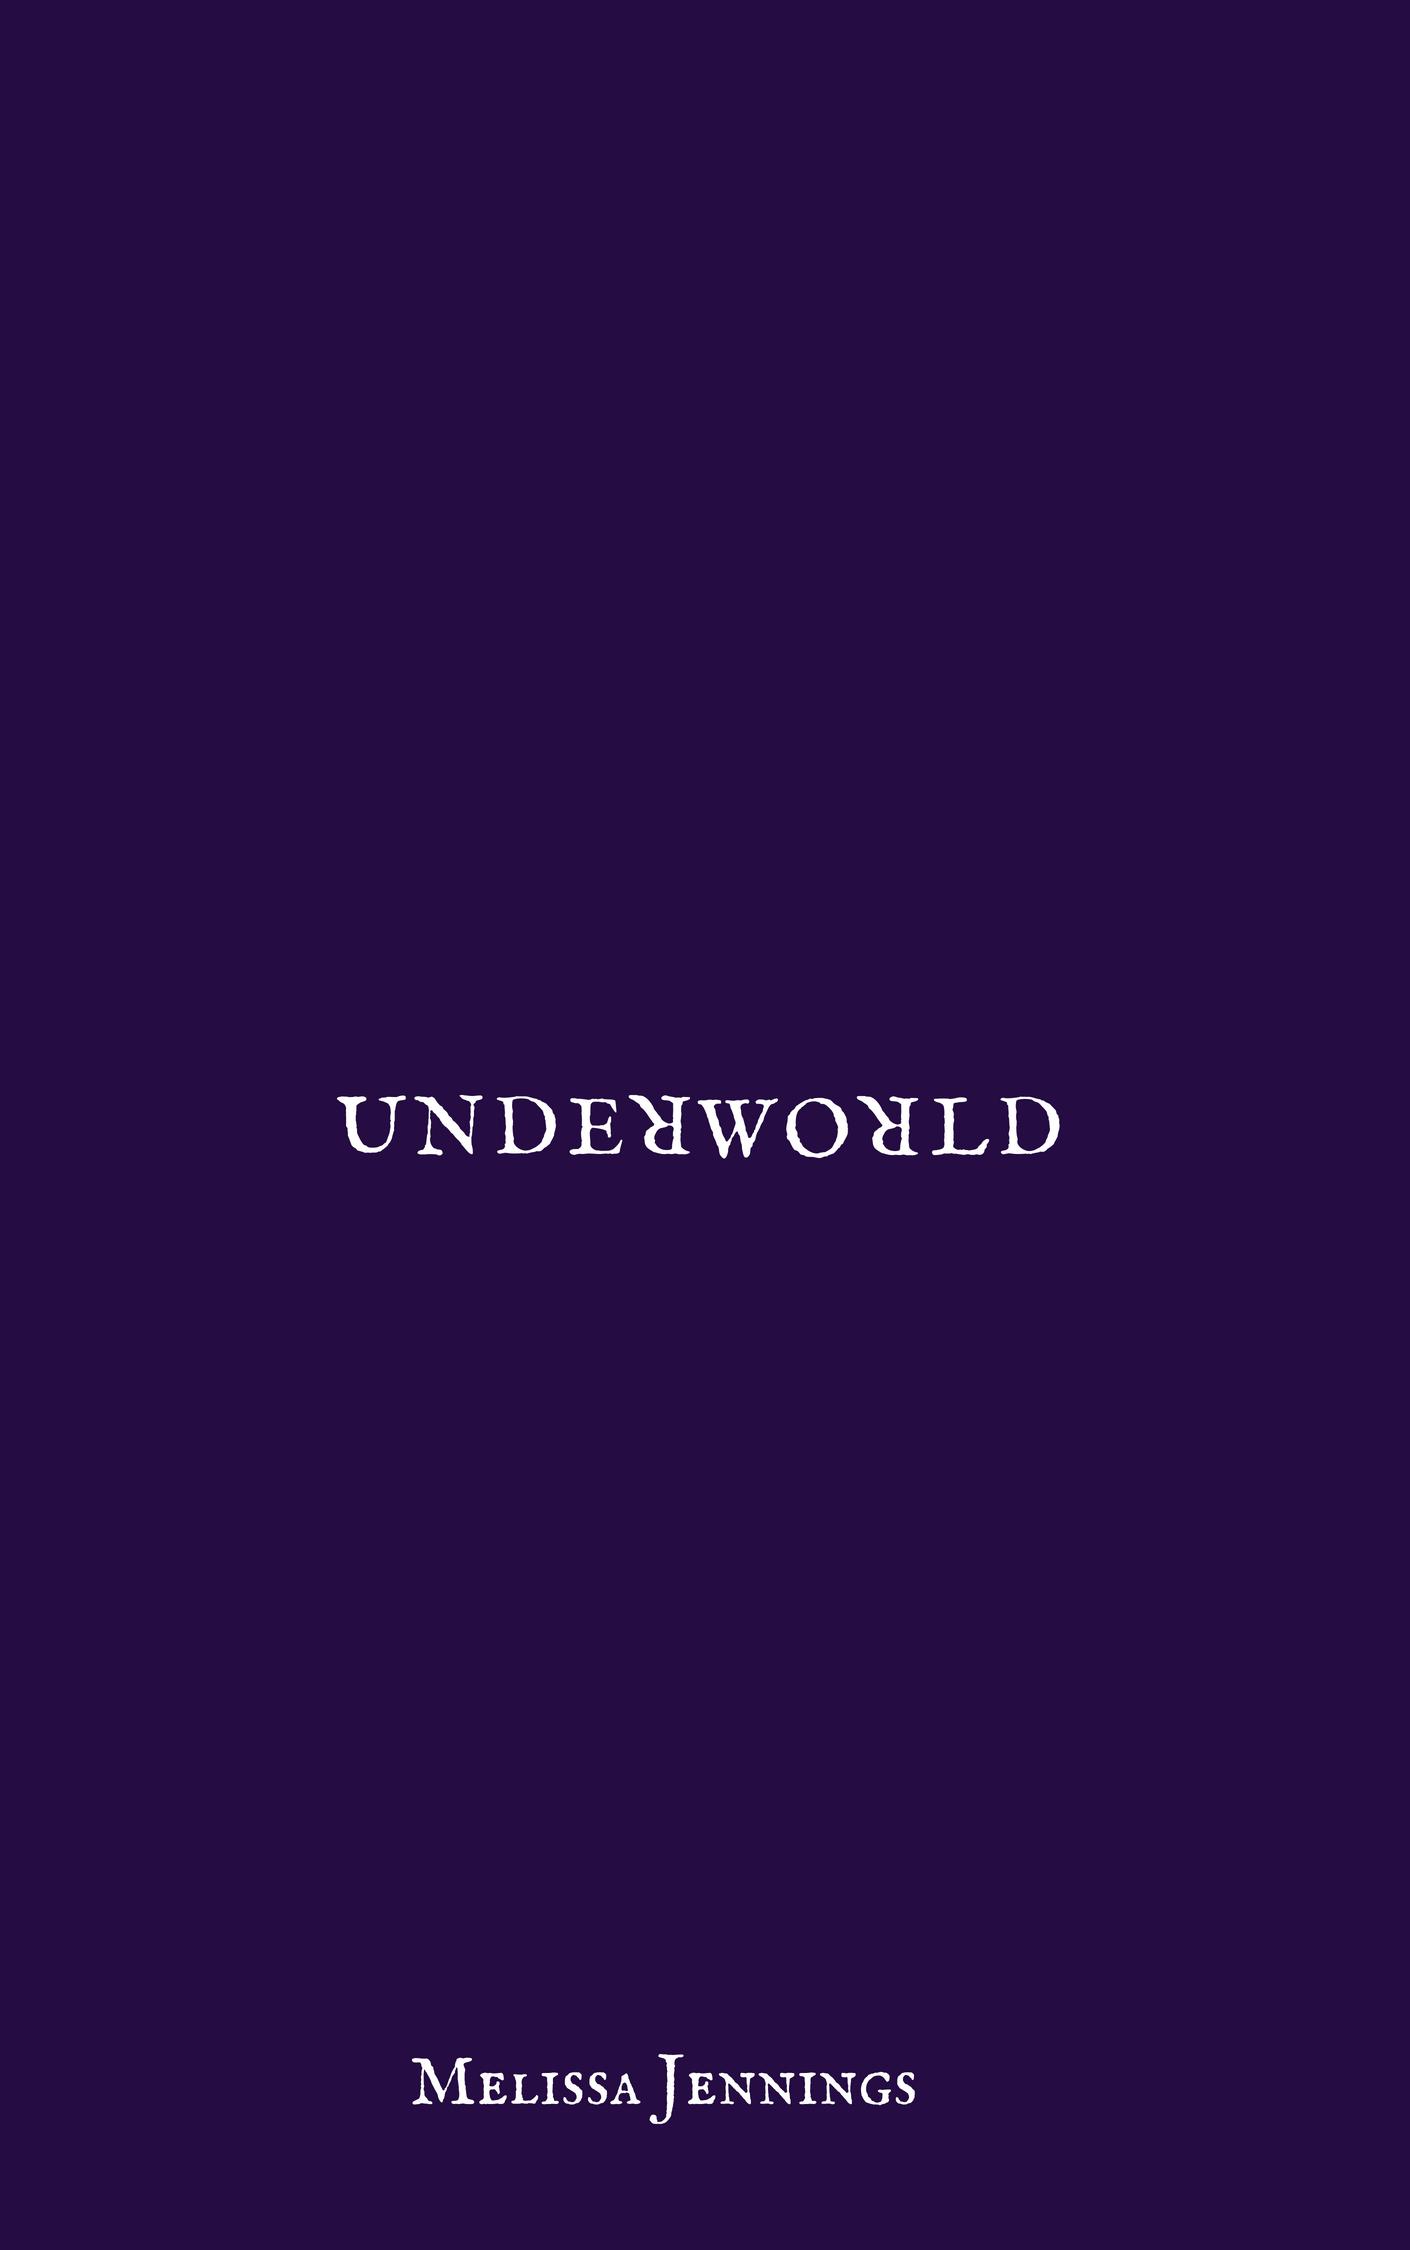 underworld goodreads 3.jpg